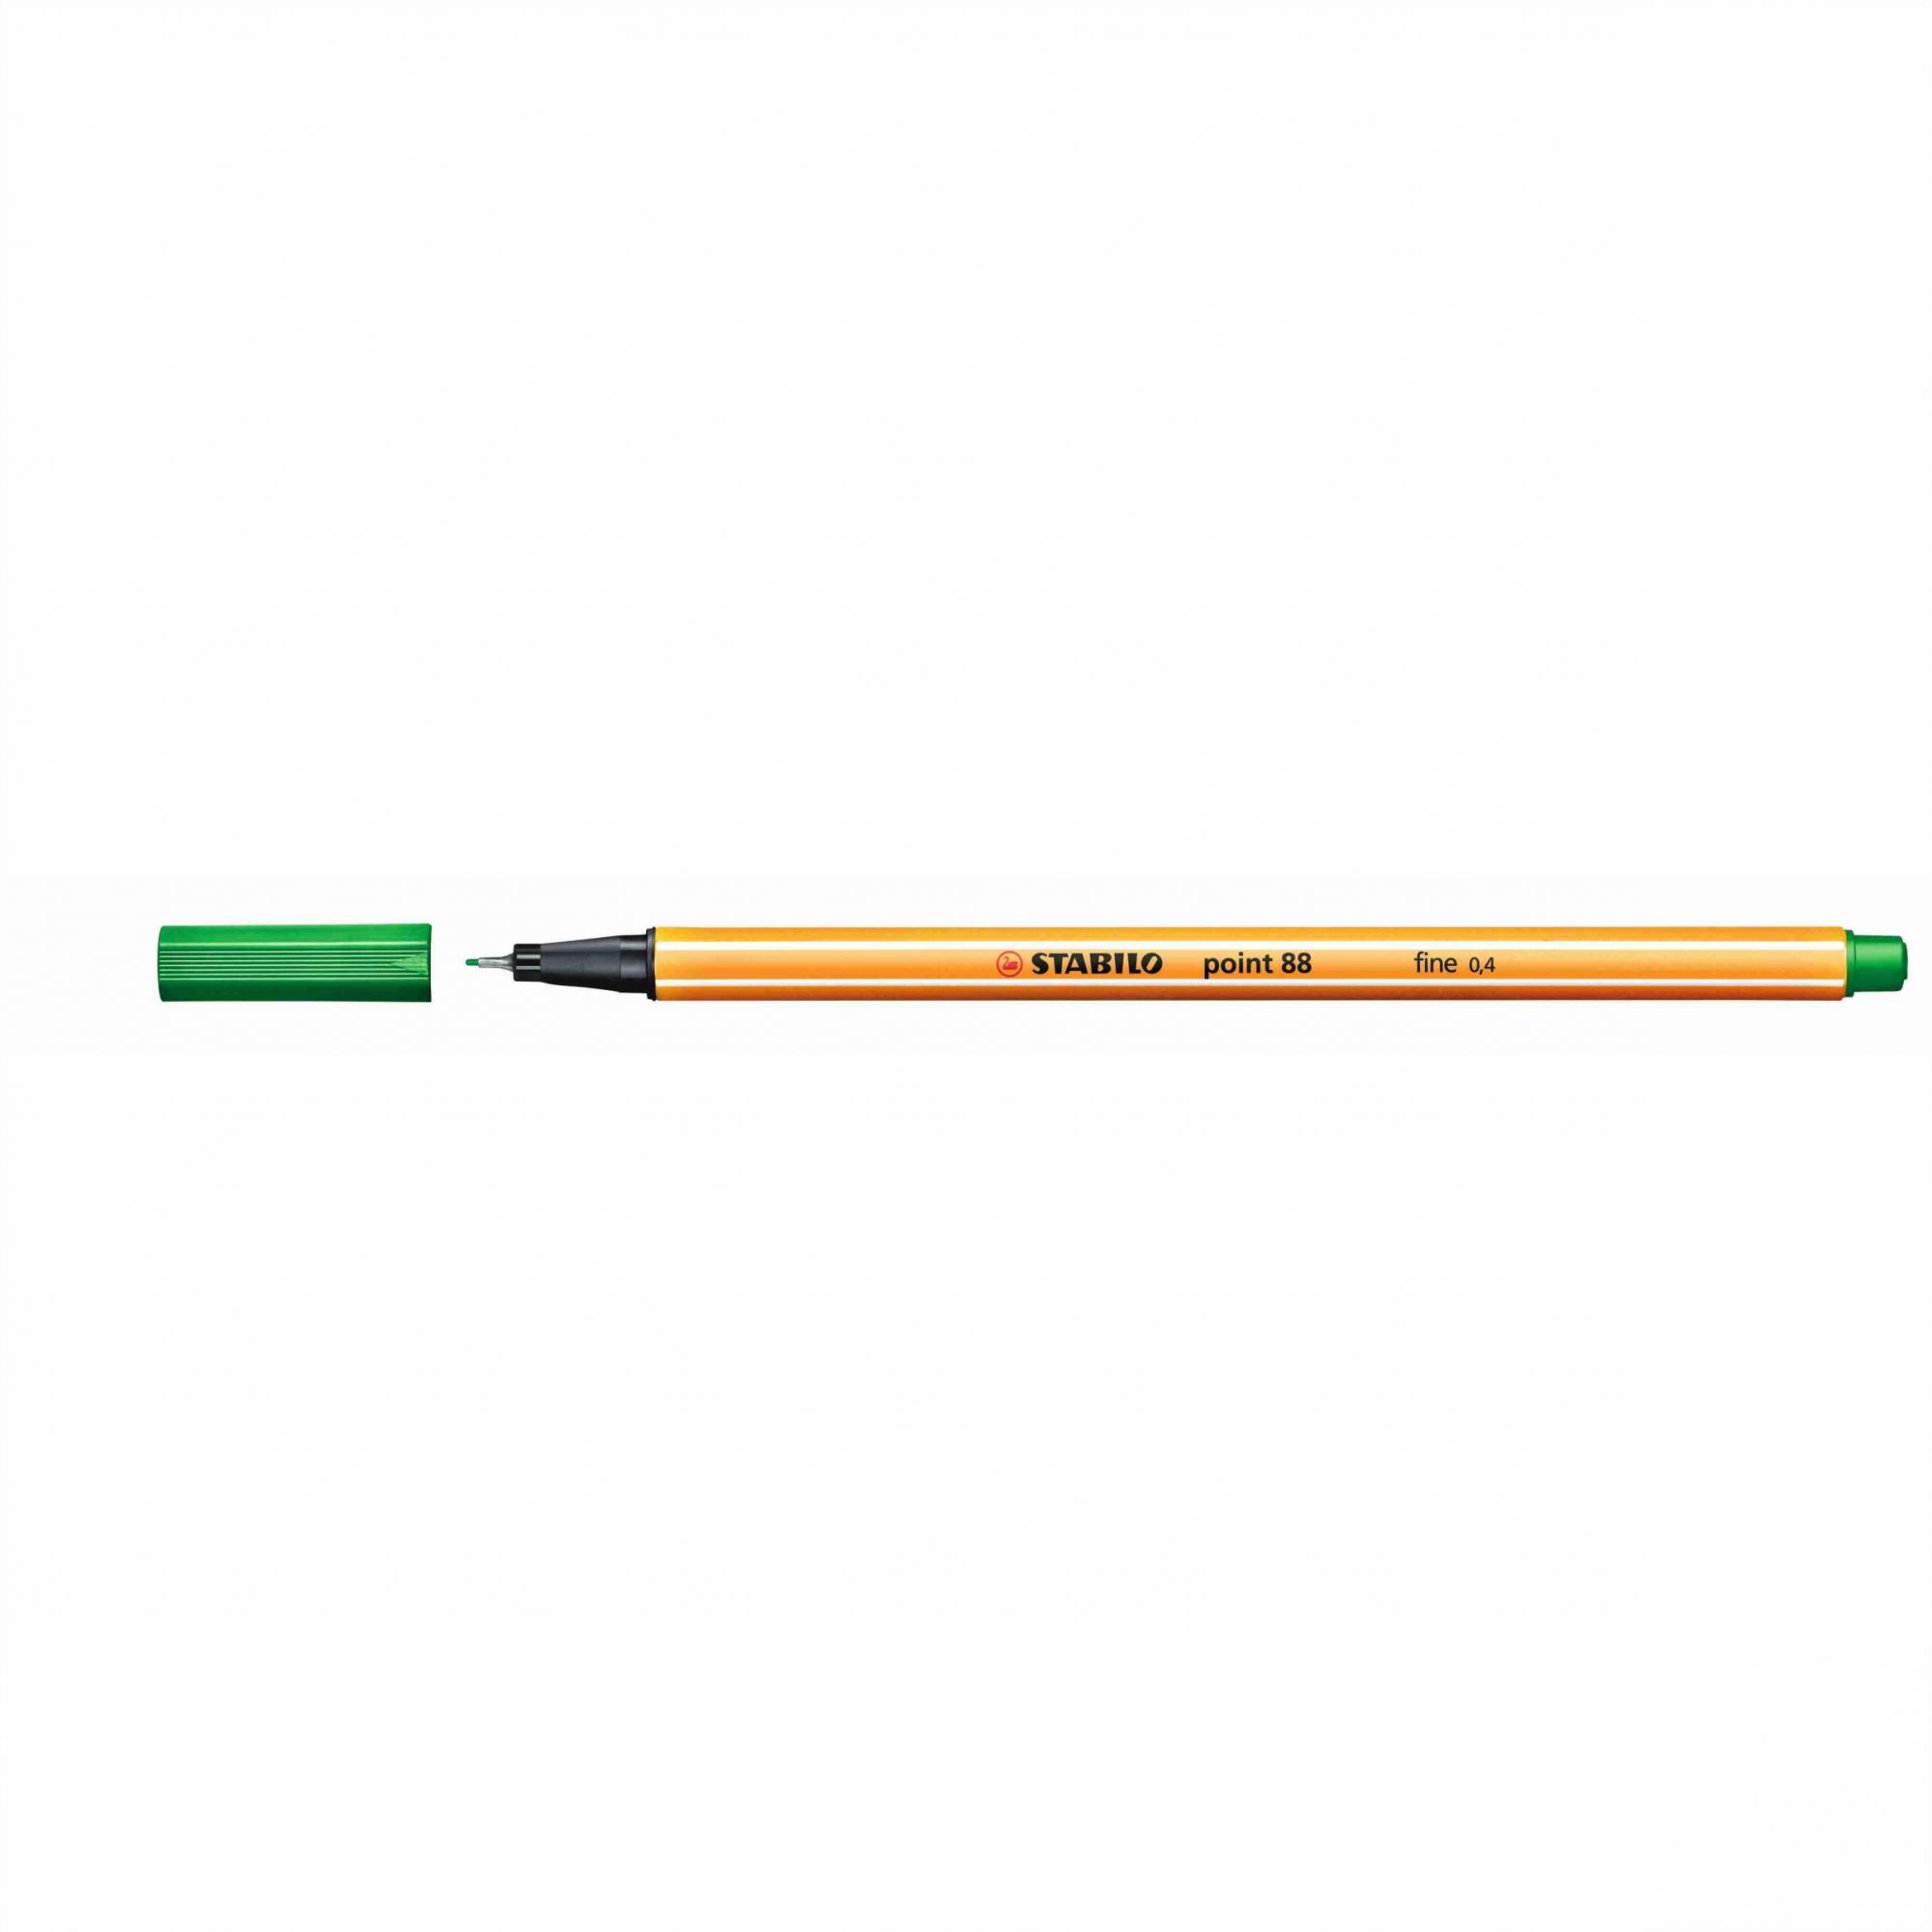 Caneta Hidrográfica 0.4 verde oliva POINT 88 Stabilo